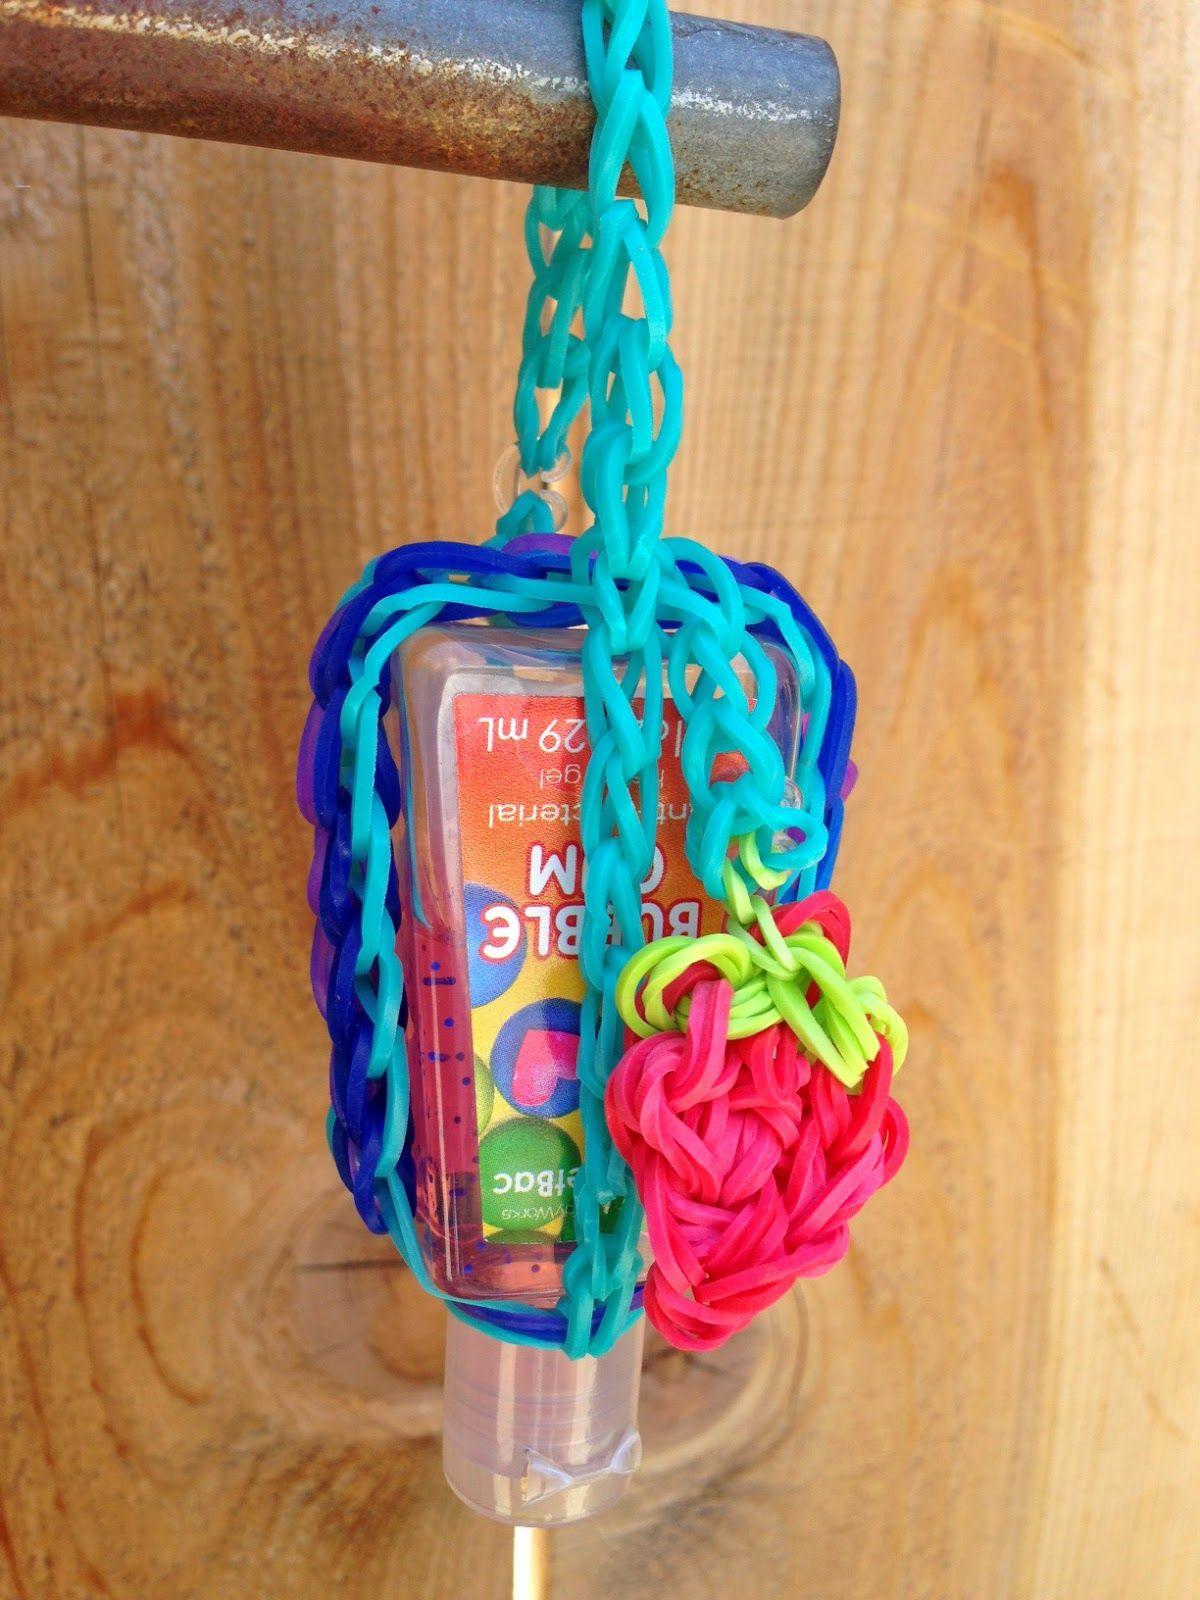 Hand Sanitizer Holder Made Of Rainbow Loom Bands Easy Kid Diy